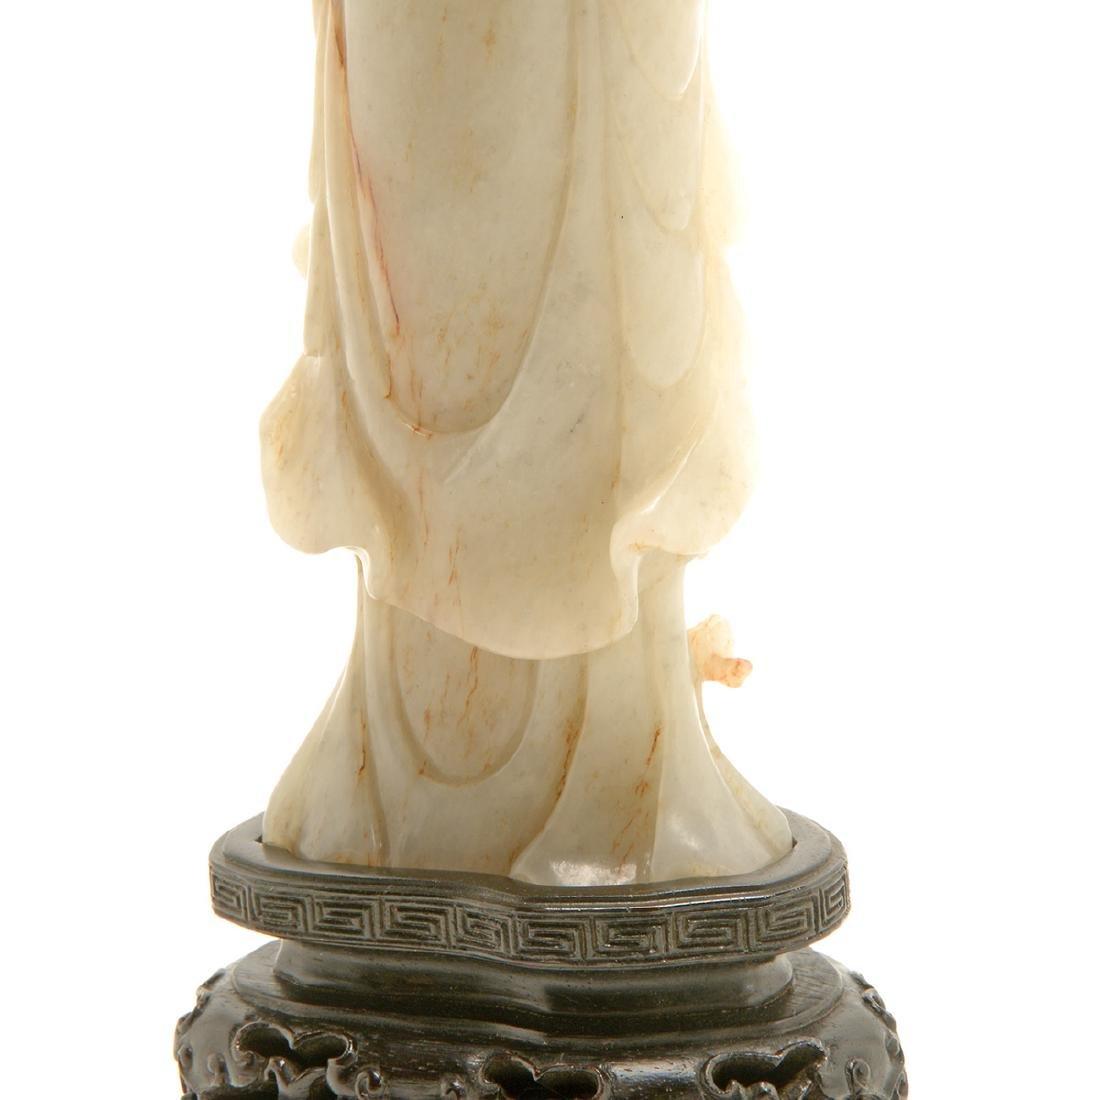 Jade Figure of Guanyin, Late Qing/Republic Period - 8